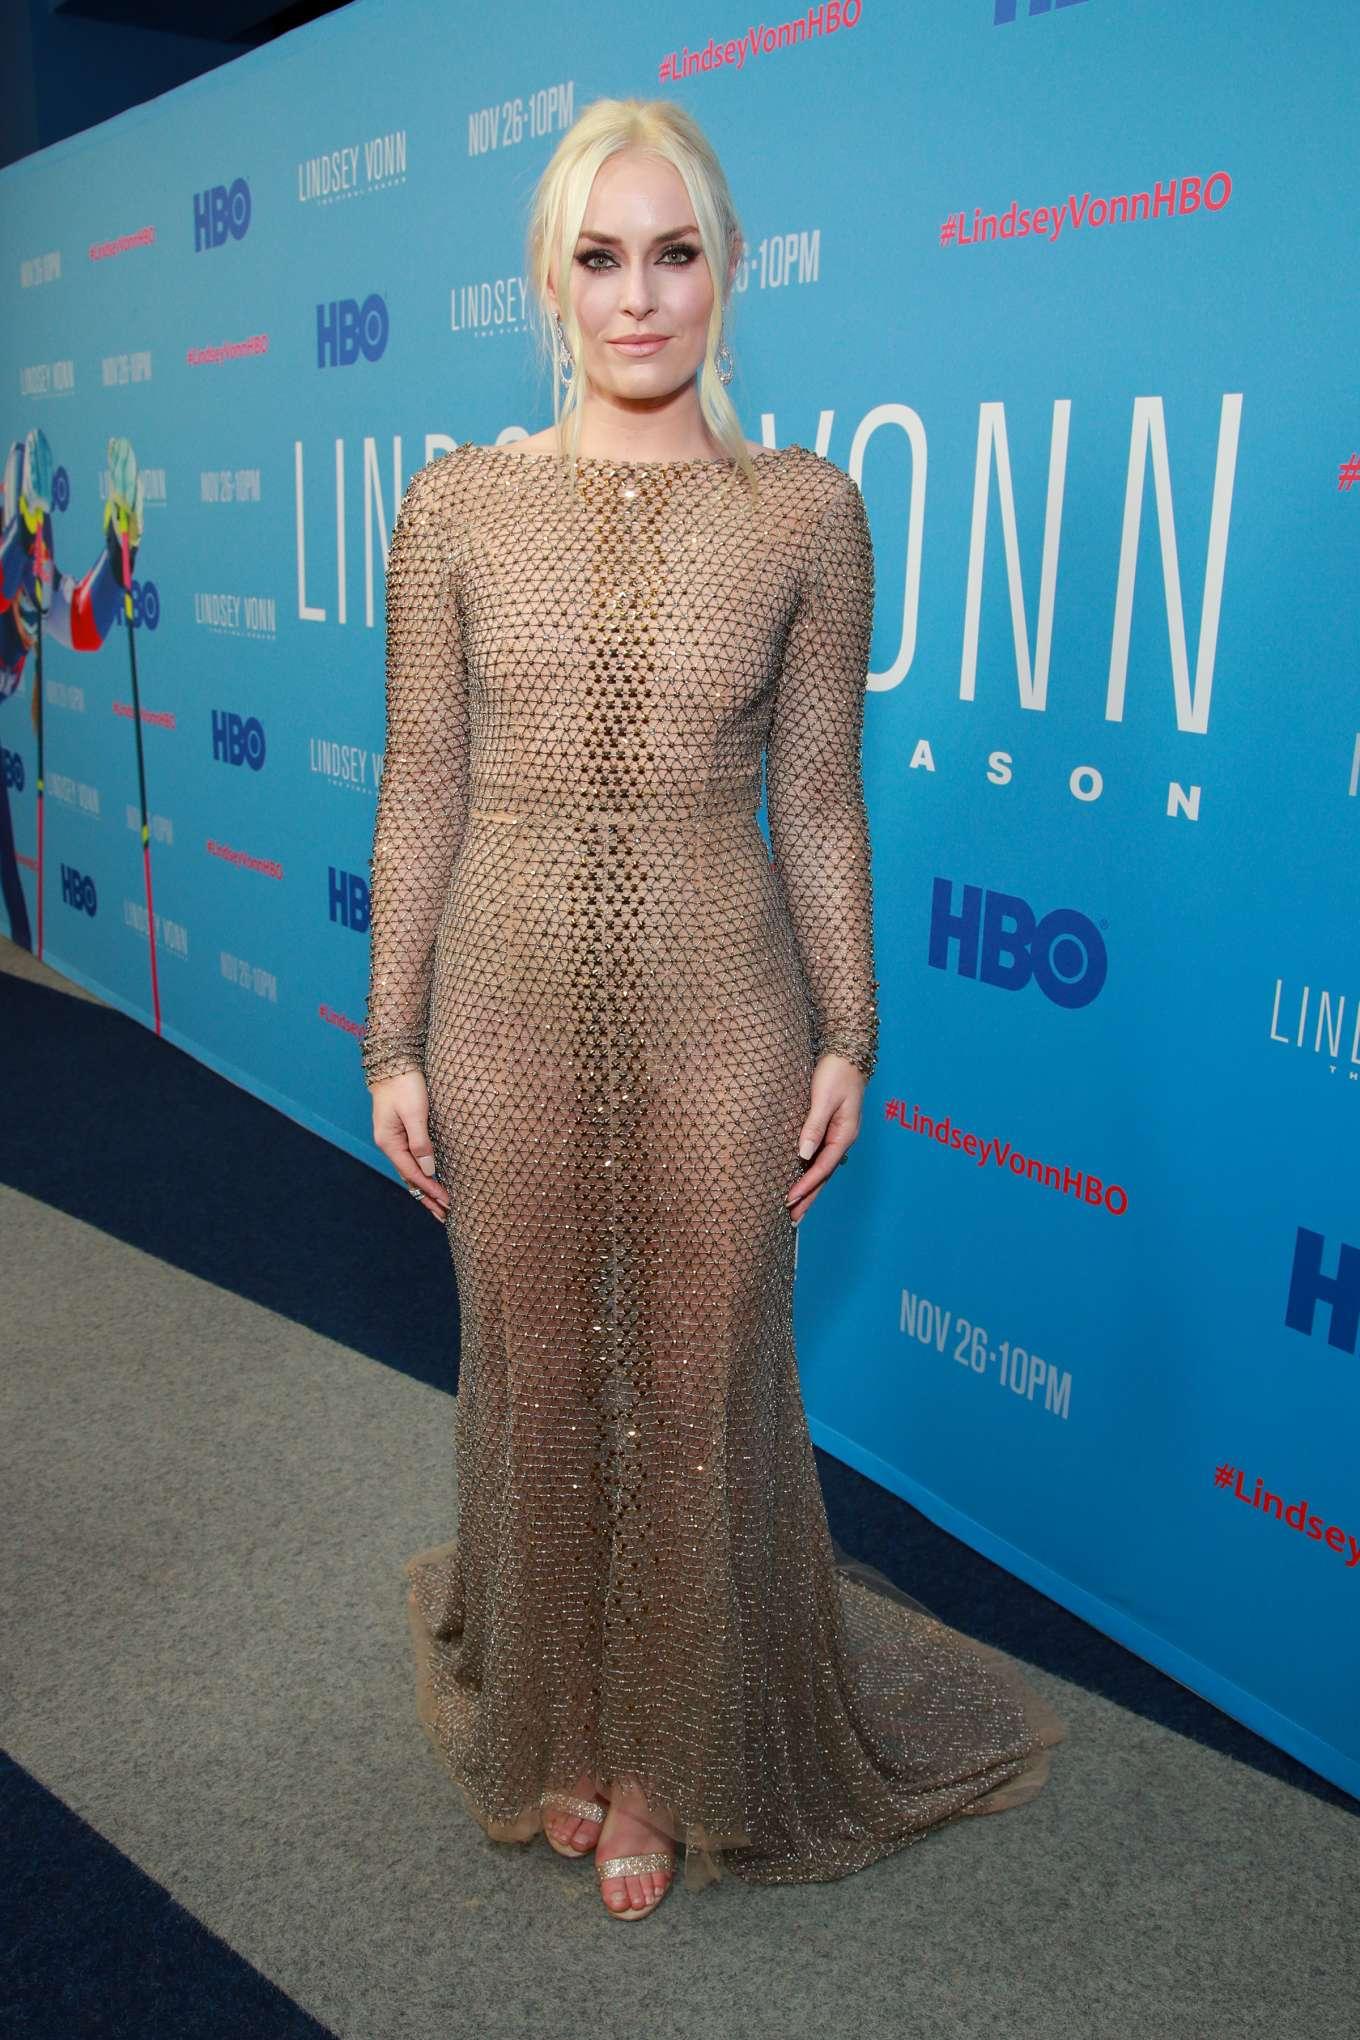 Lindsey Vonn 2019 : Lindsey Vonn – Lindsey Vonn: The Final Season Premiere in Los Angeles-11